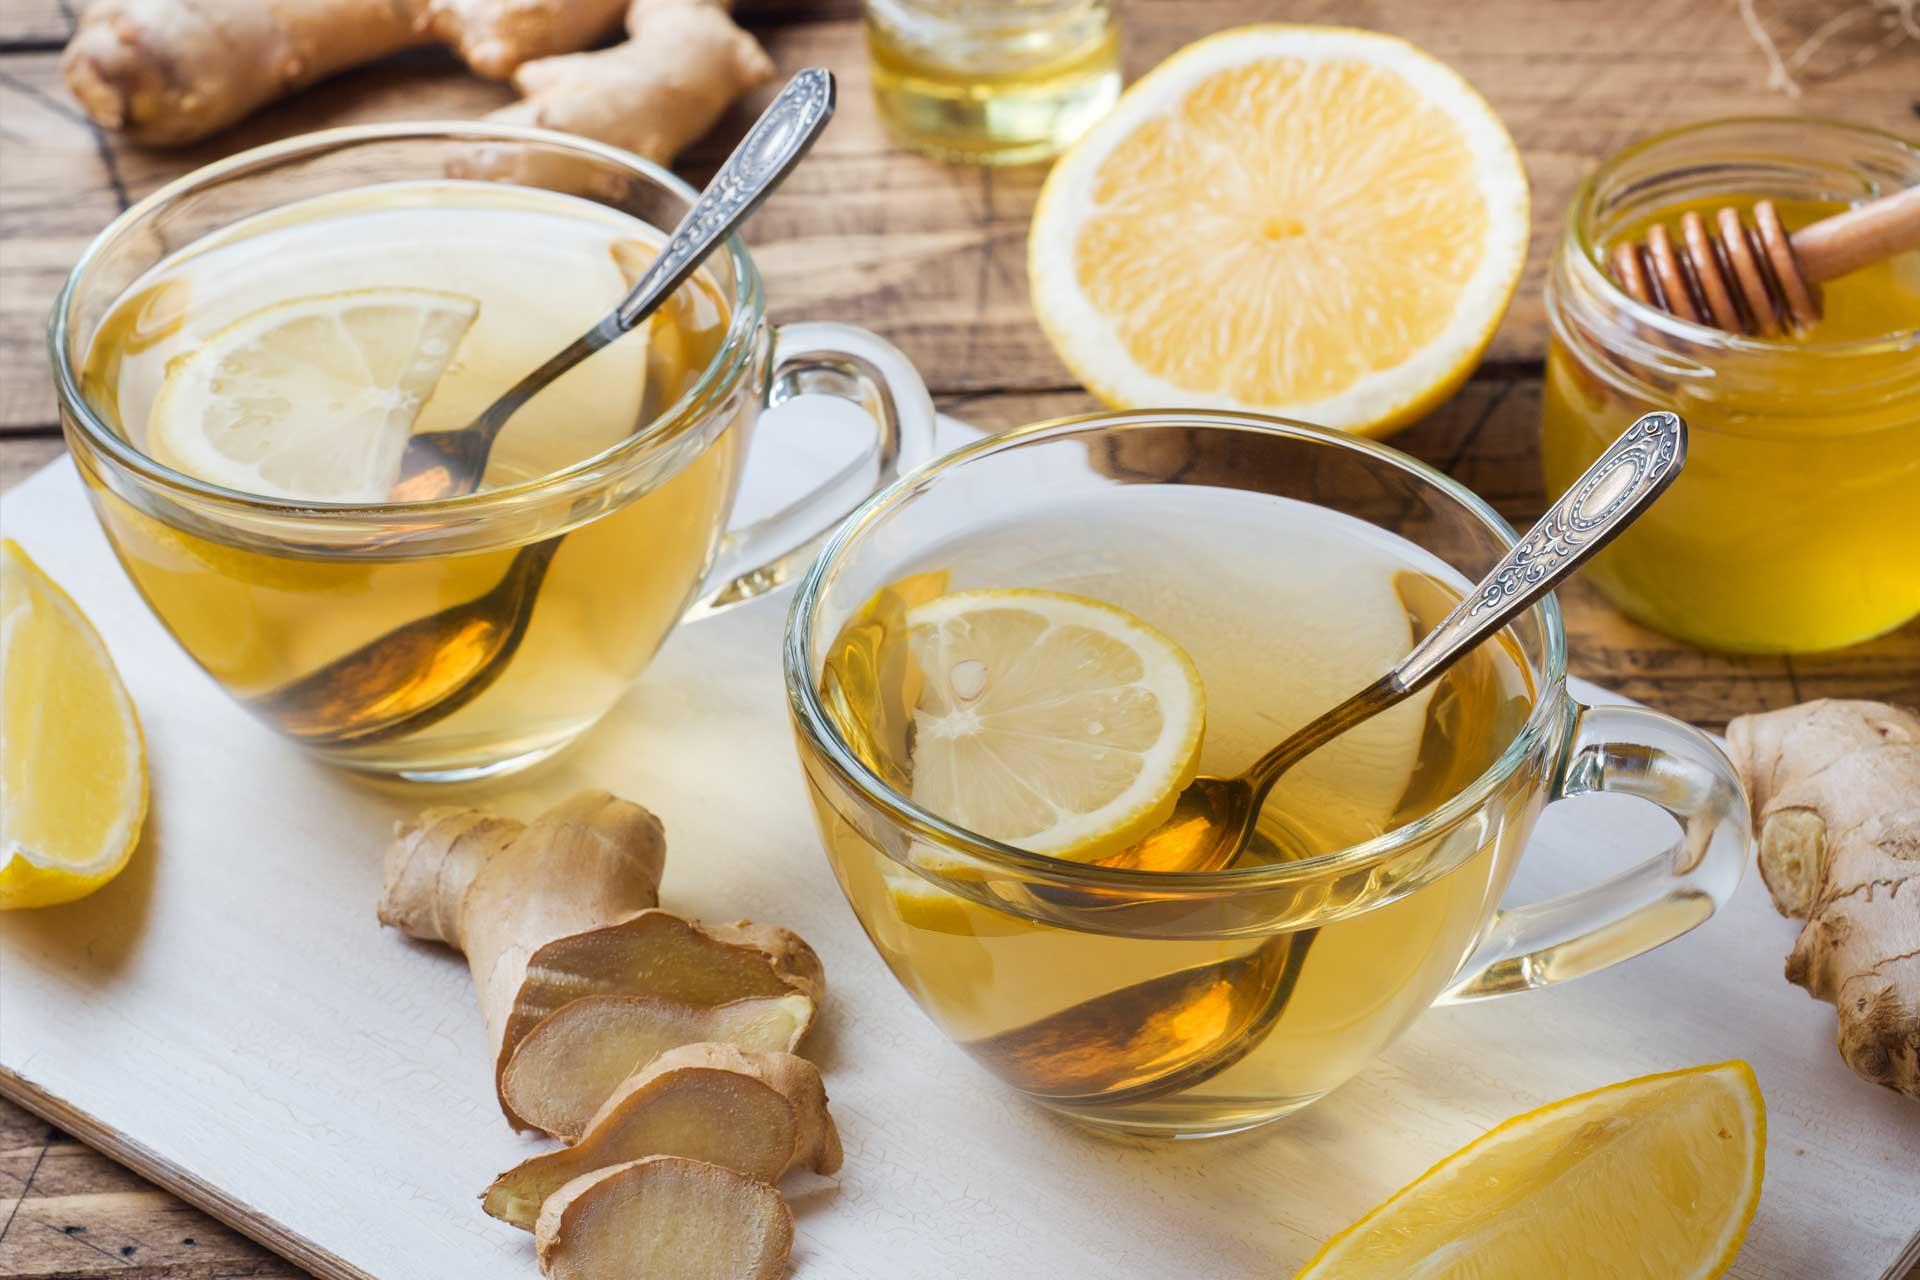 Gesunde Selbstgemachte Ingwer-Tee Rezepte